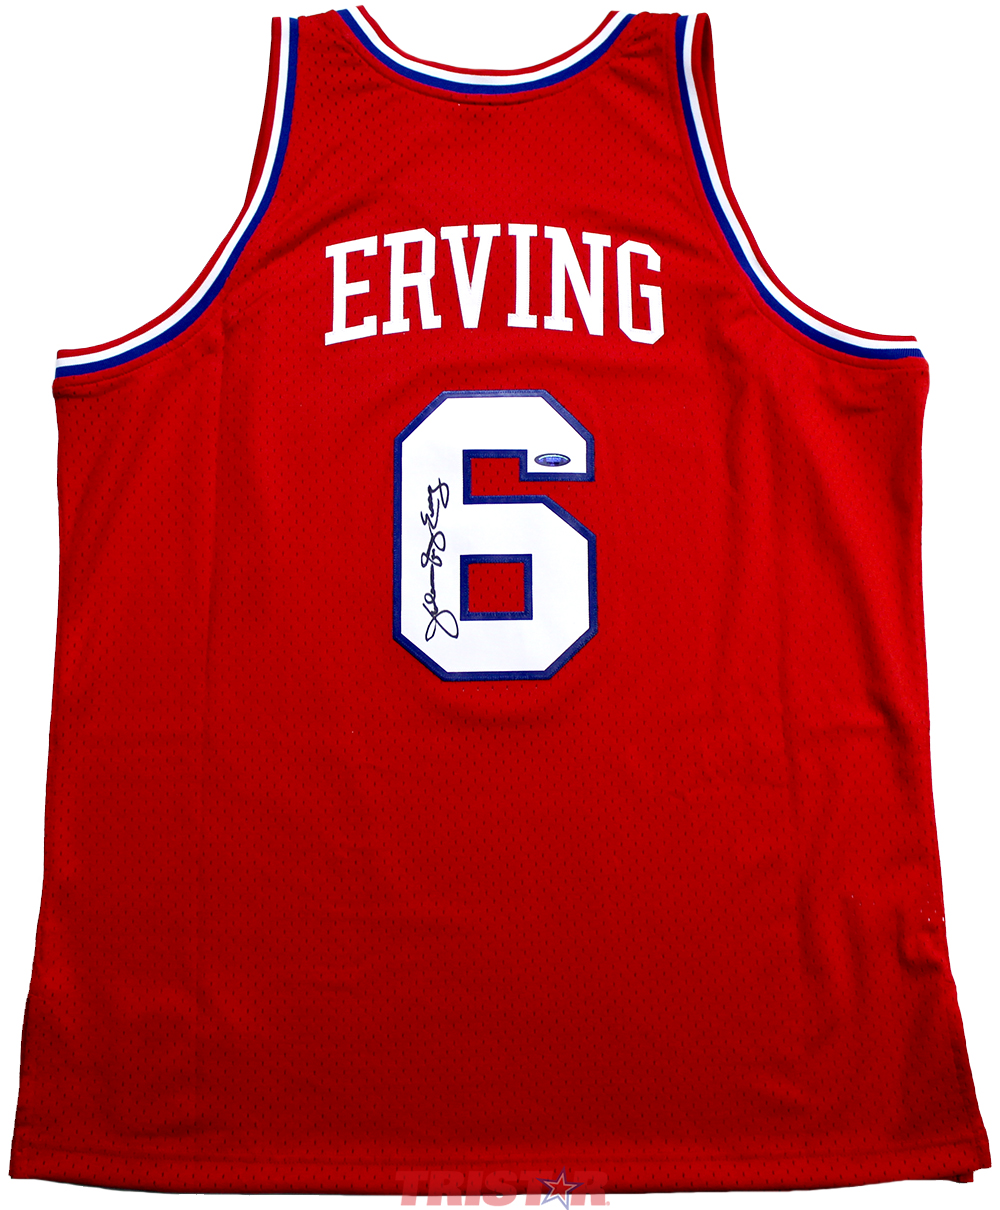 on sale 486e7 b1e3a Julius Erving Autographed Philadelphia 76ers 1982-83 Mitchell & Ness Jersey